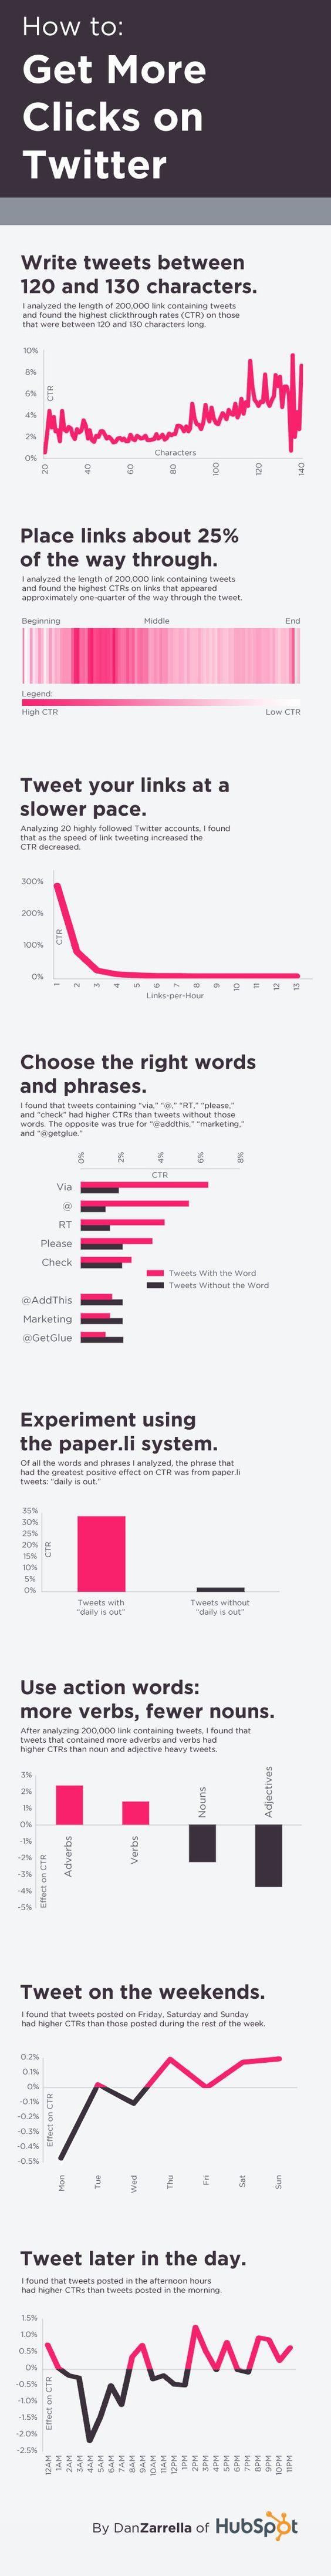 [Infographic] How to Get More Clicks on Twitter | Dan Zarrella